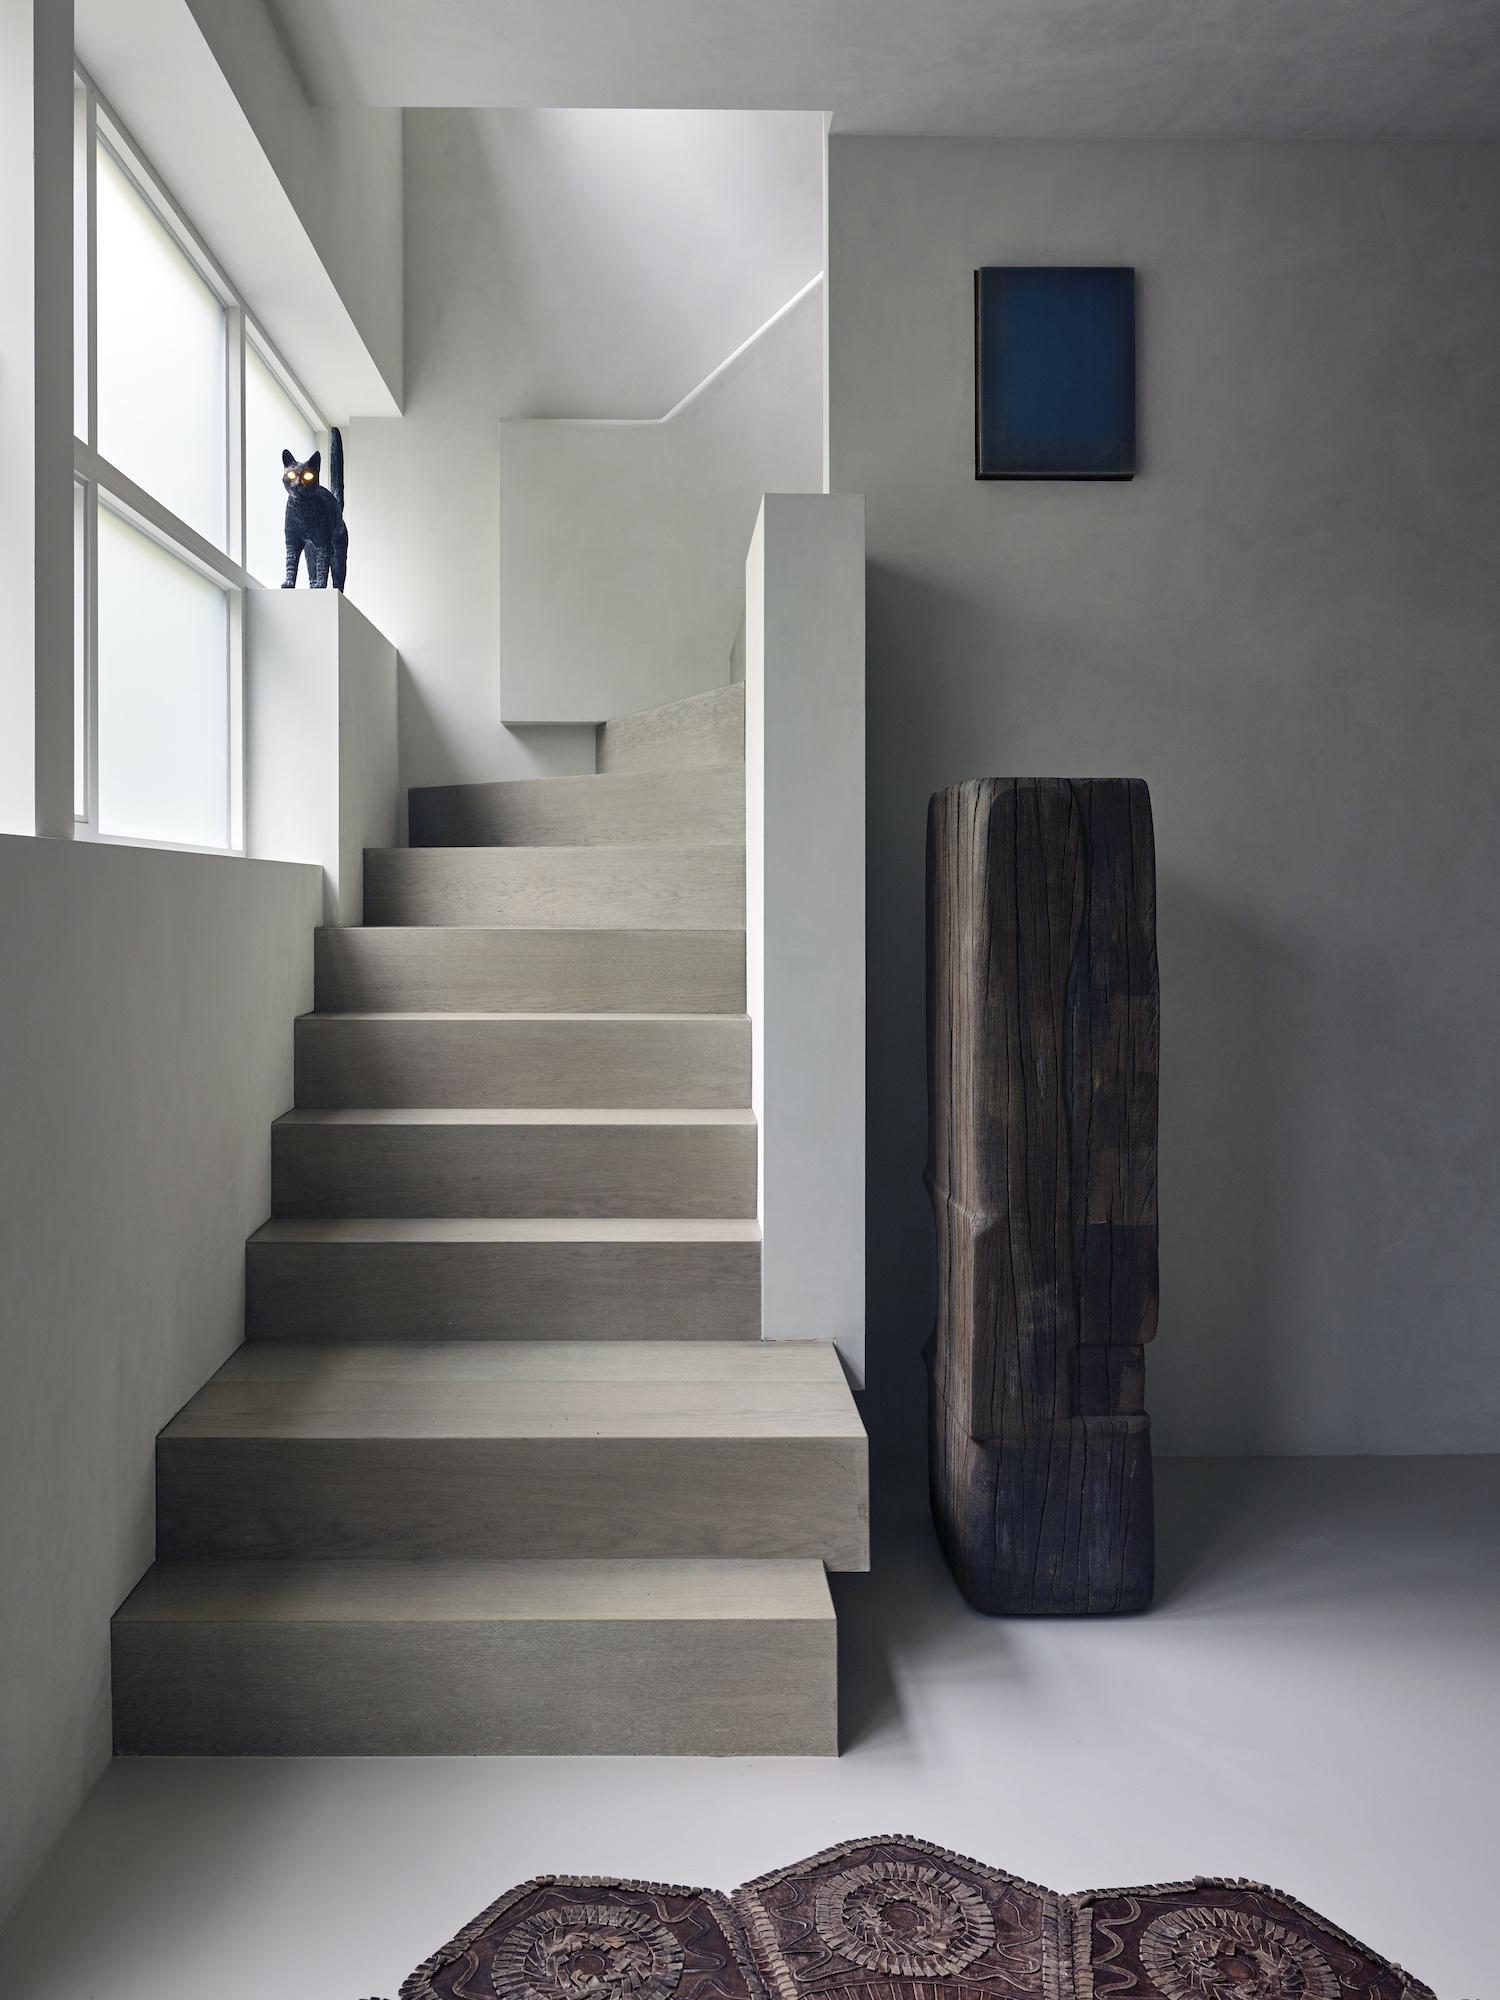 est living amsterdam residence studio piet boon 23